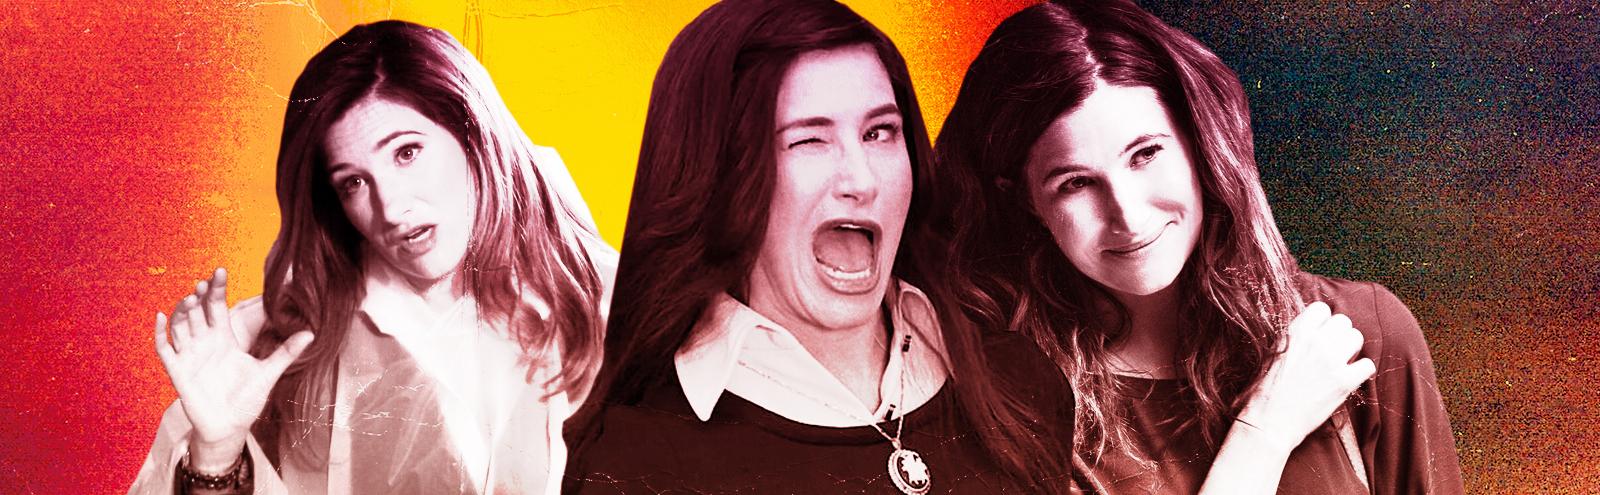 The Evolution Of Dramedy Queen Kathryn Hahn